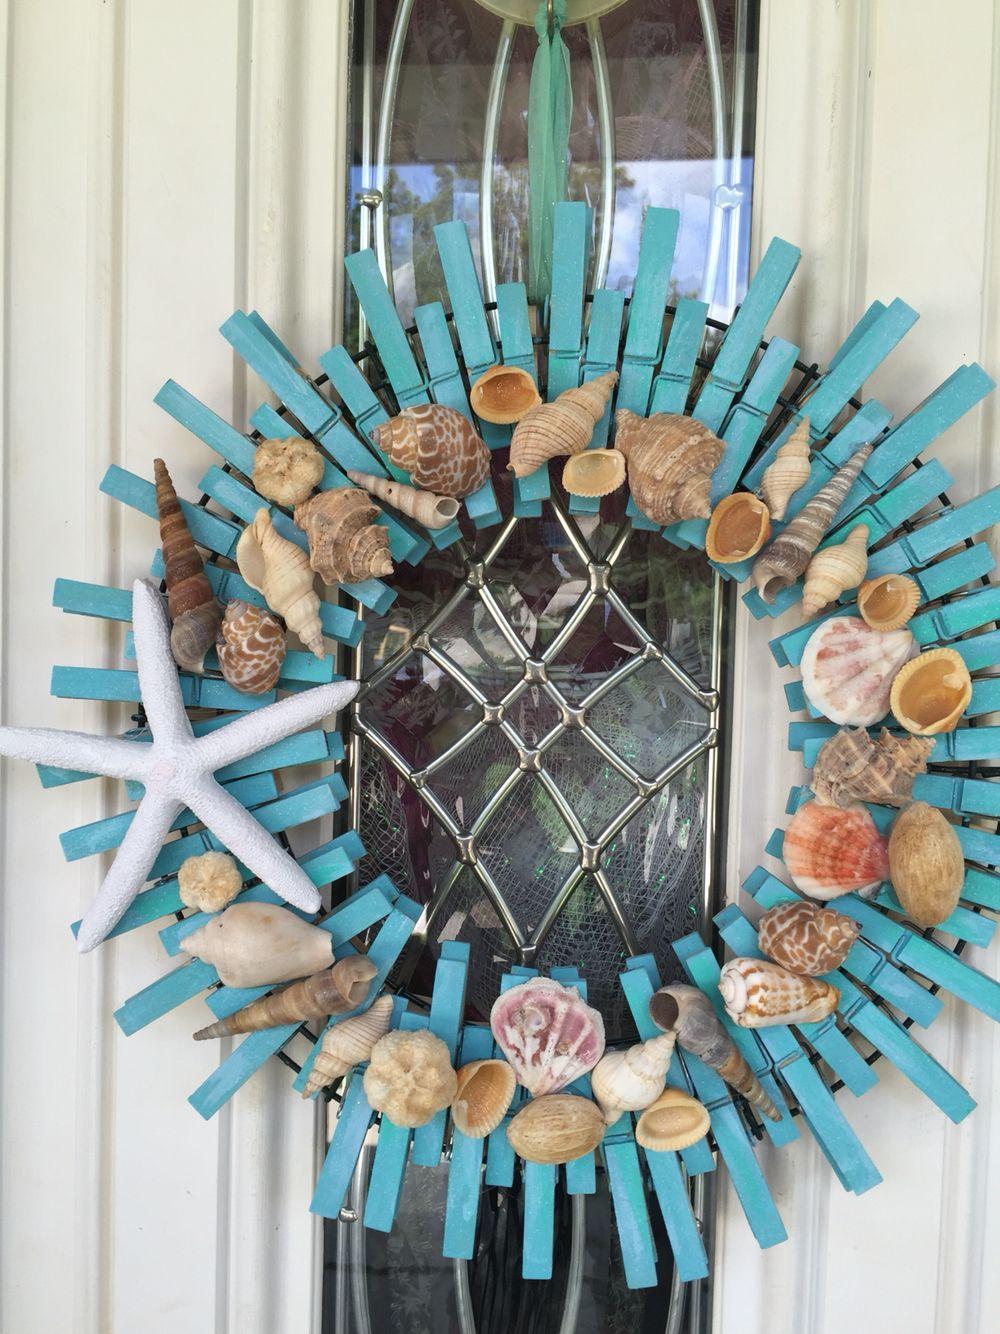 Beach Clothespin Wreath Plaj El Sanatlari Kendin Yap Elisi